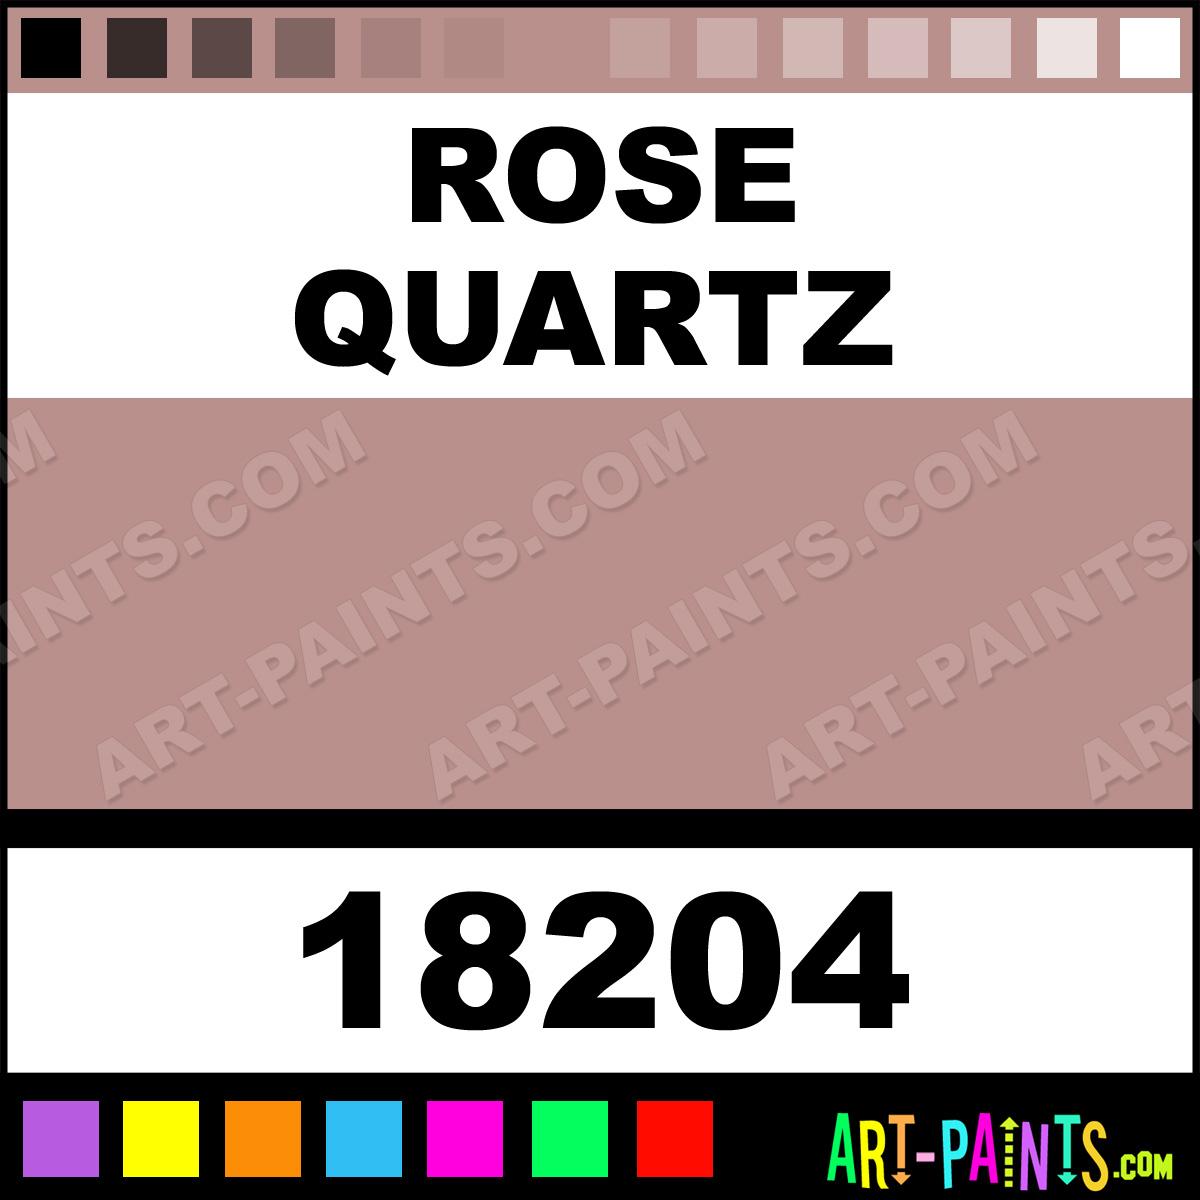 Rose Quartz Make It Stone Textured Spray Paints - 18204 ...